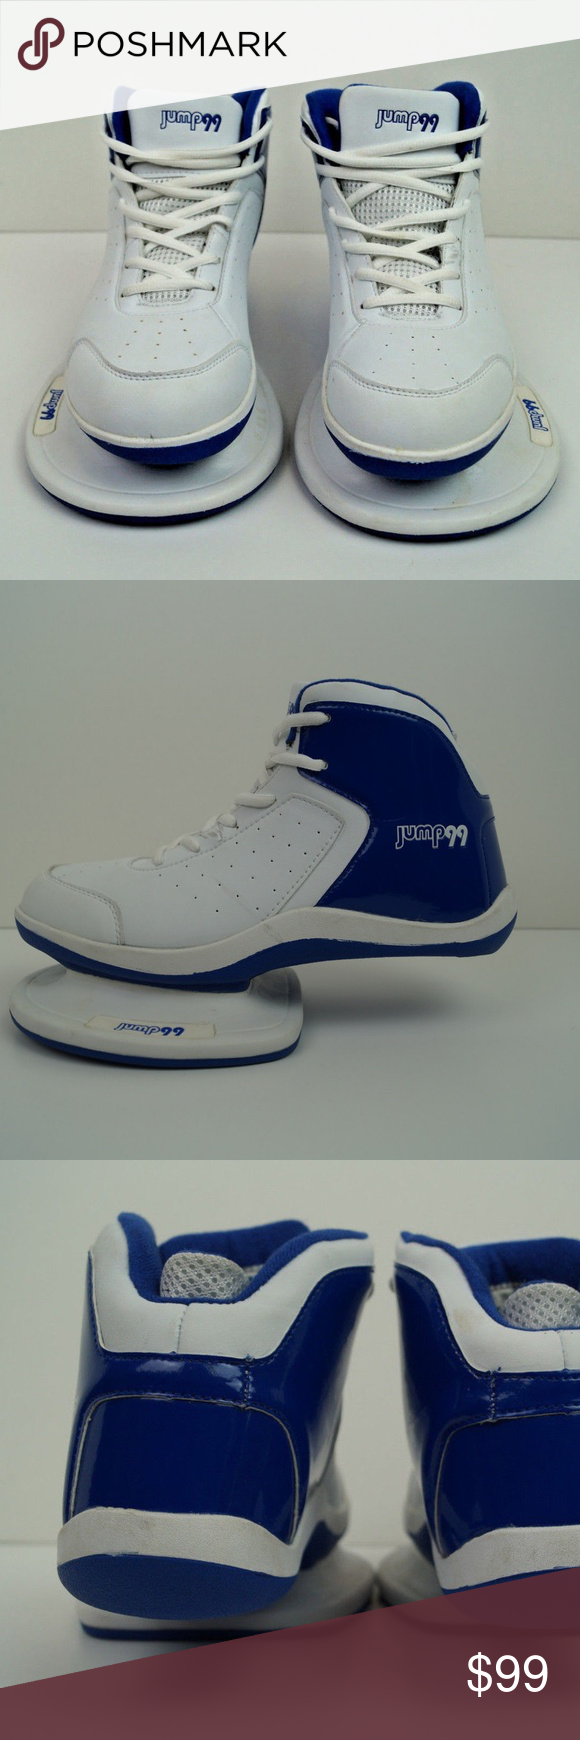 Jump 99 Plyometric Basketball Training